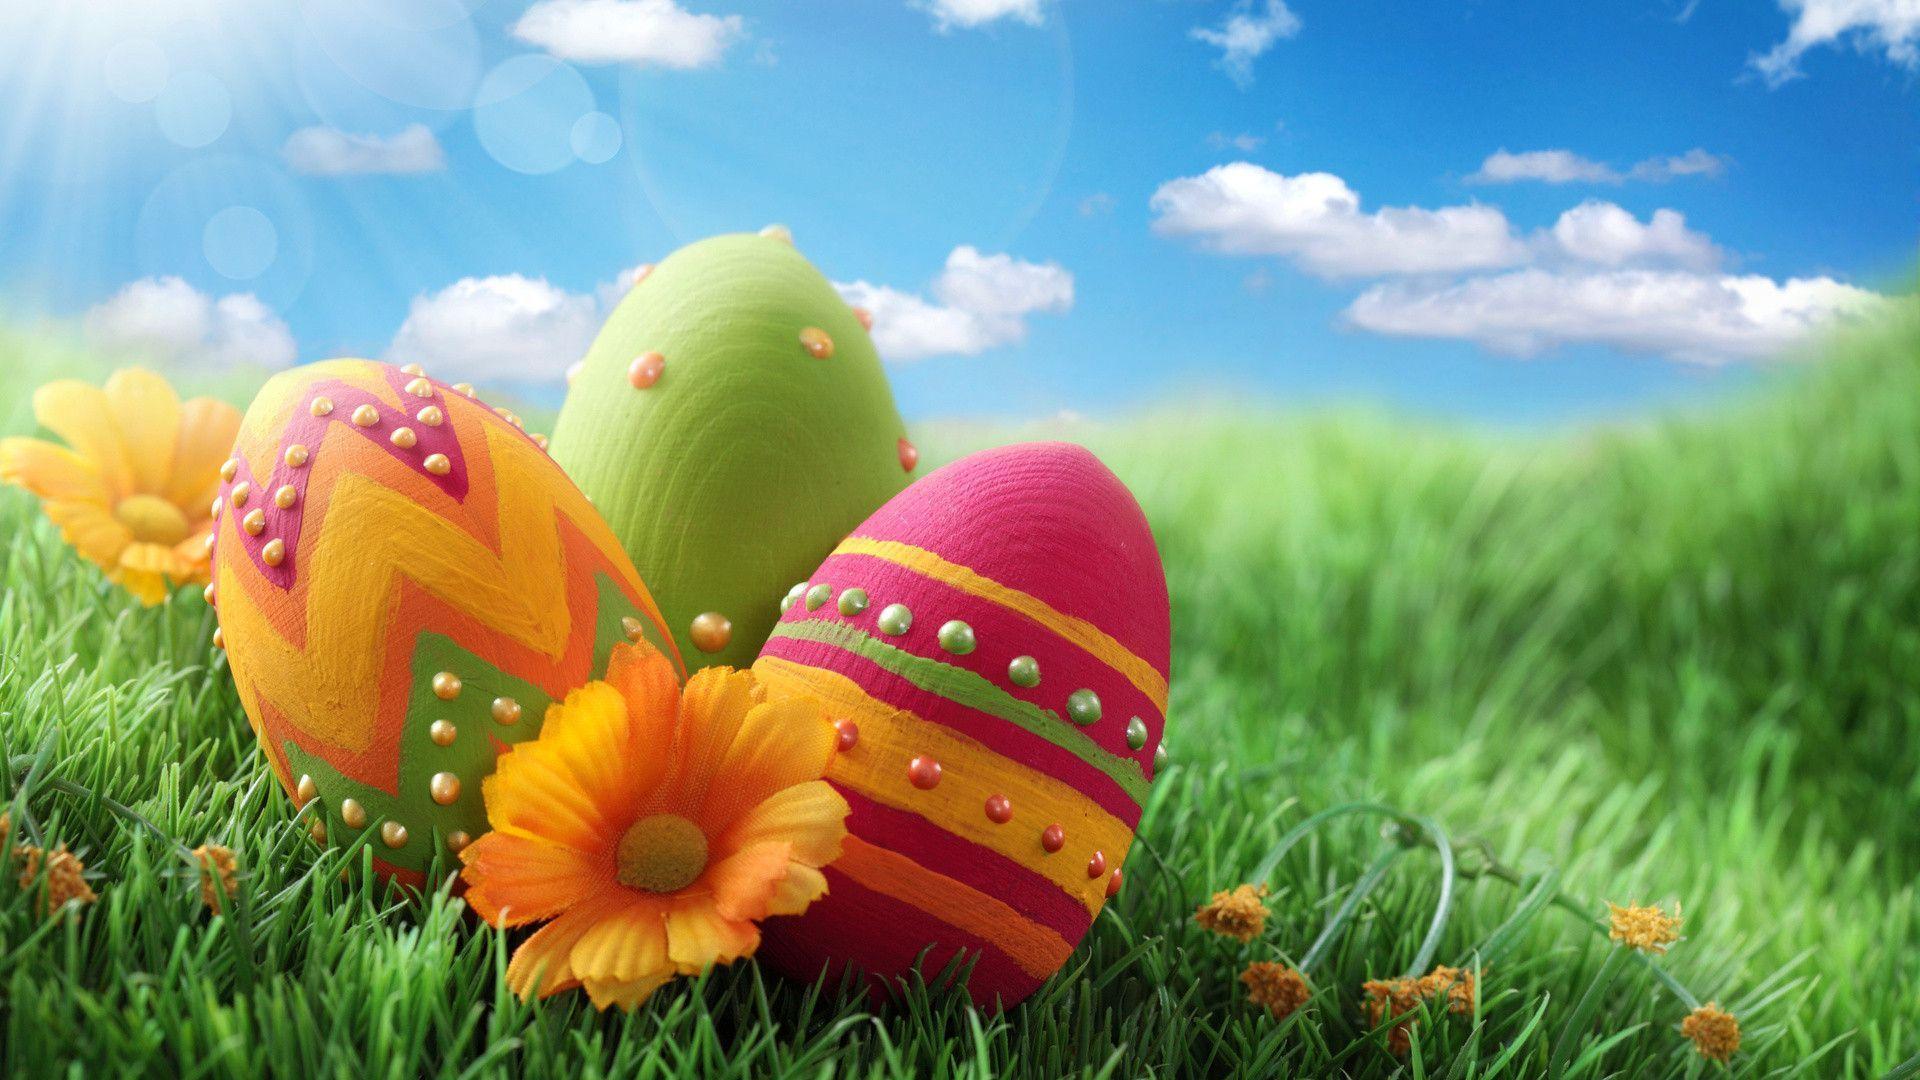 Happy Easter Wallpaper Designs Ideas